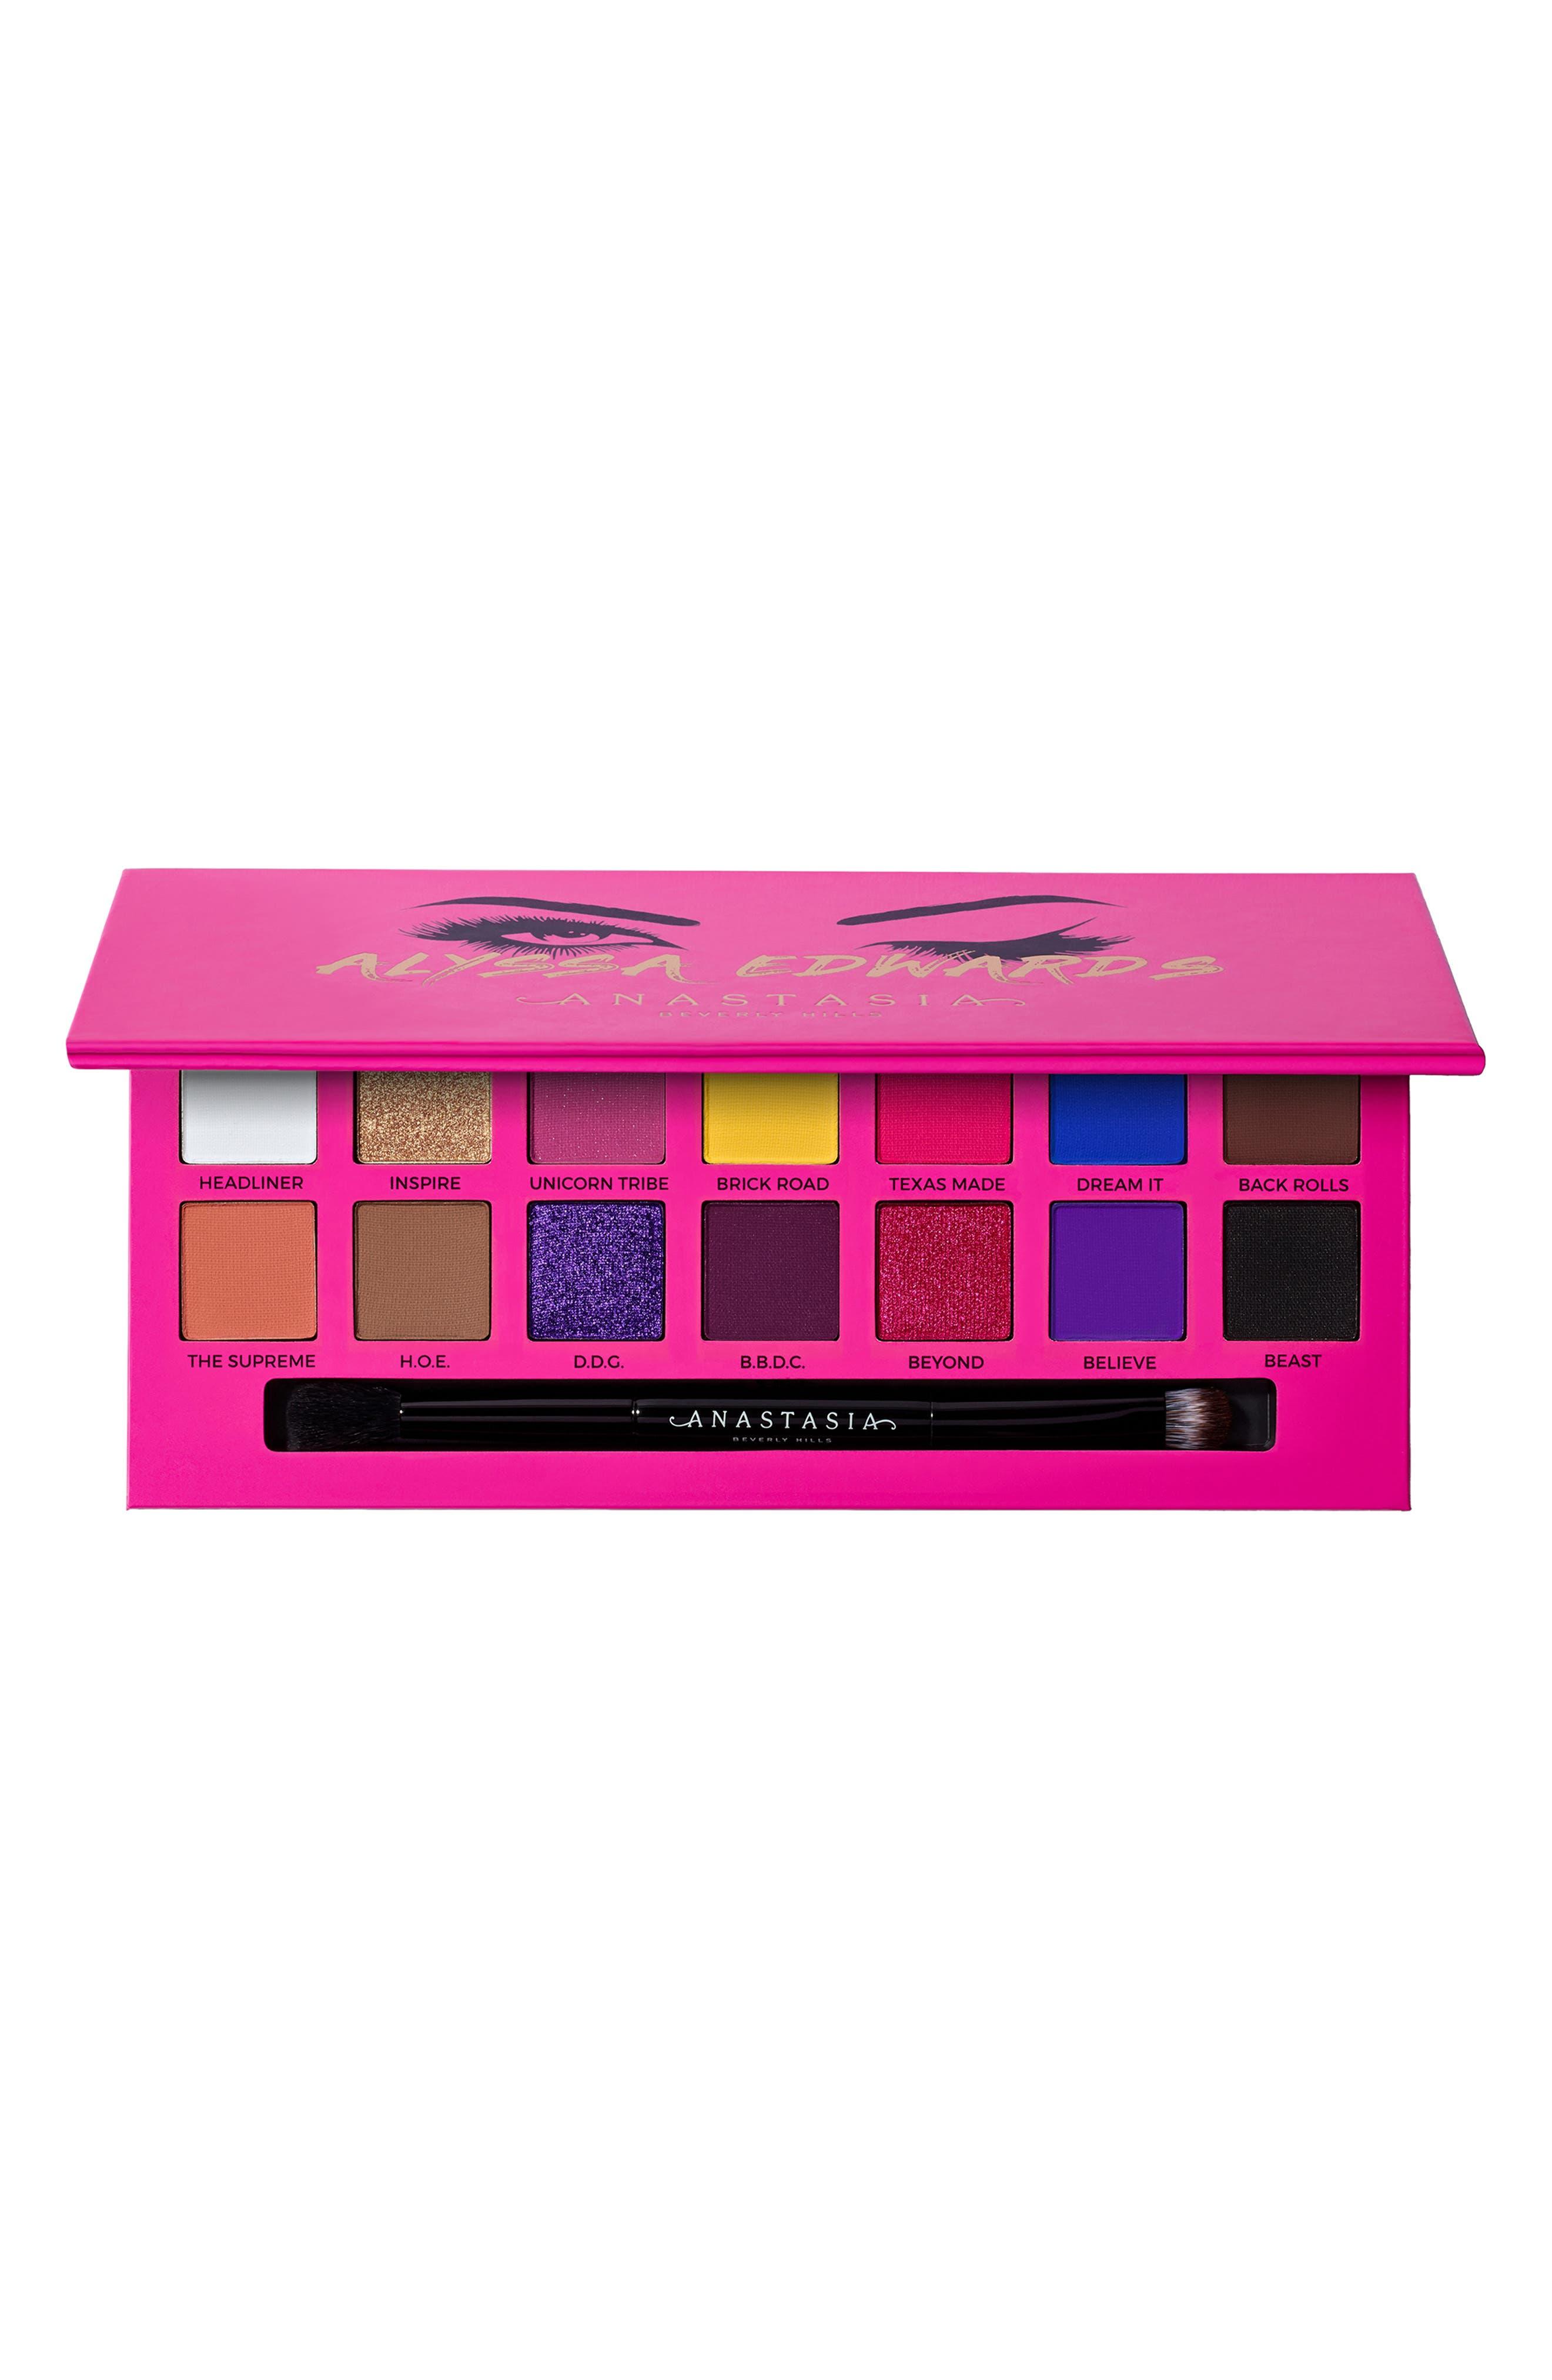 dbb06f4bf34 Anastasia Beverly Hills Alyssa Edwards Eyeshadow Palette - No Color